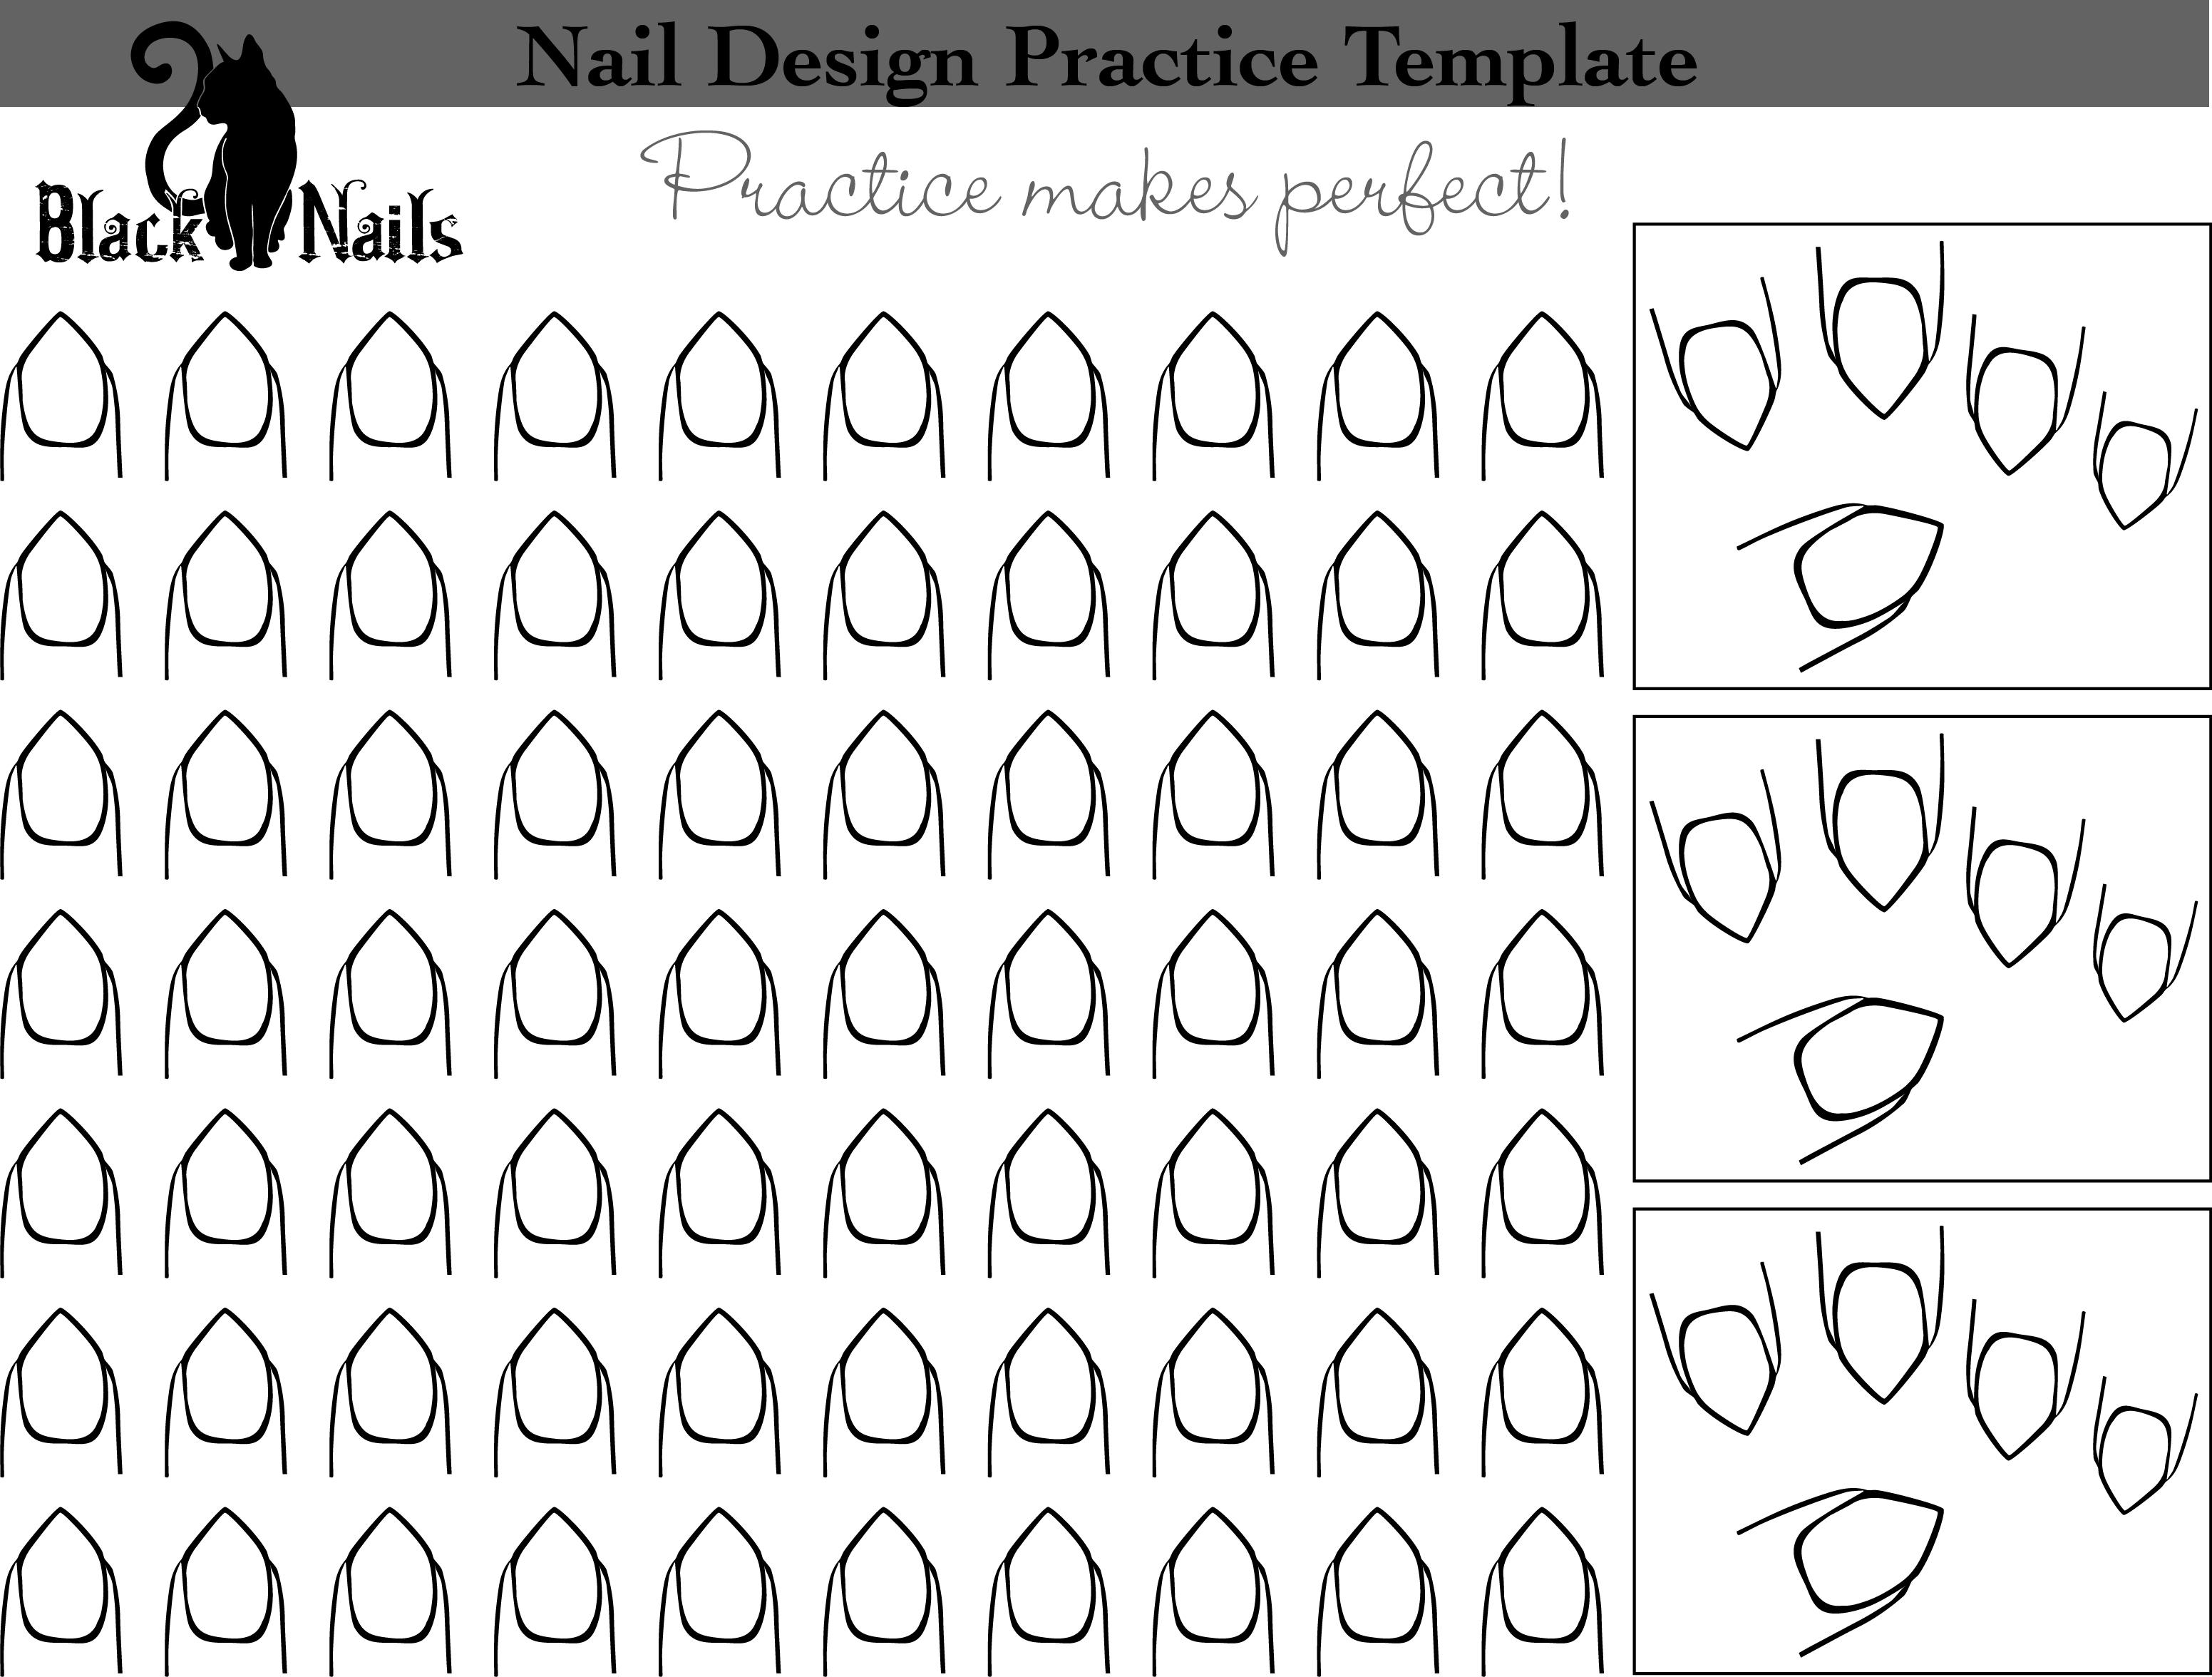 Nail Art Design Practice Templates Or Sheets - All Versions | Black - Free Printable Nail Art Designs